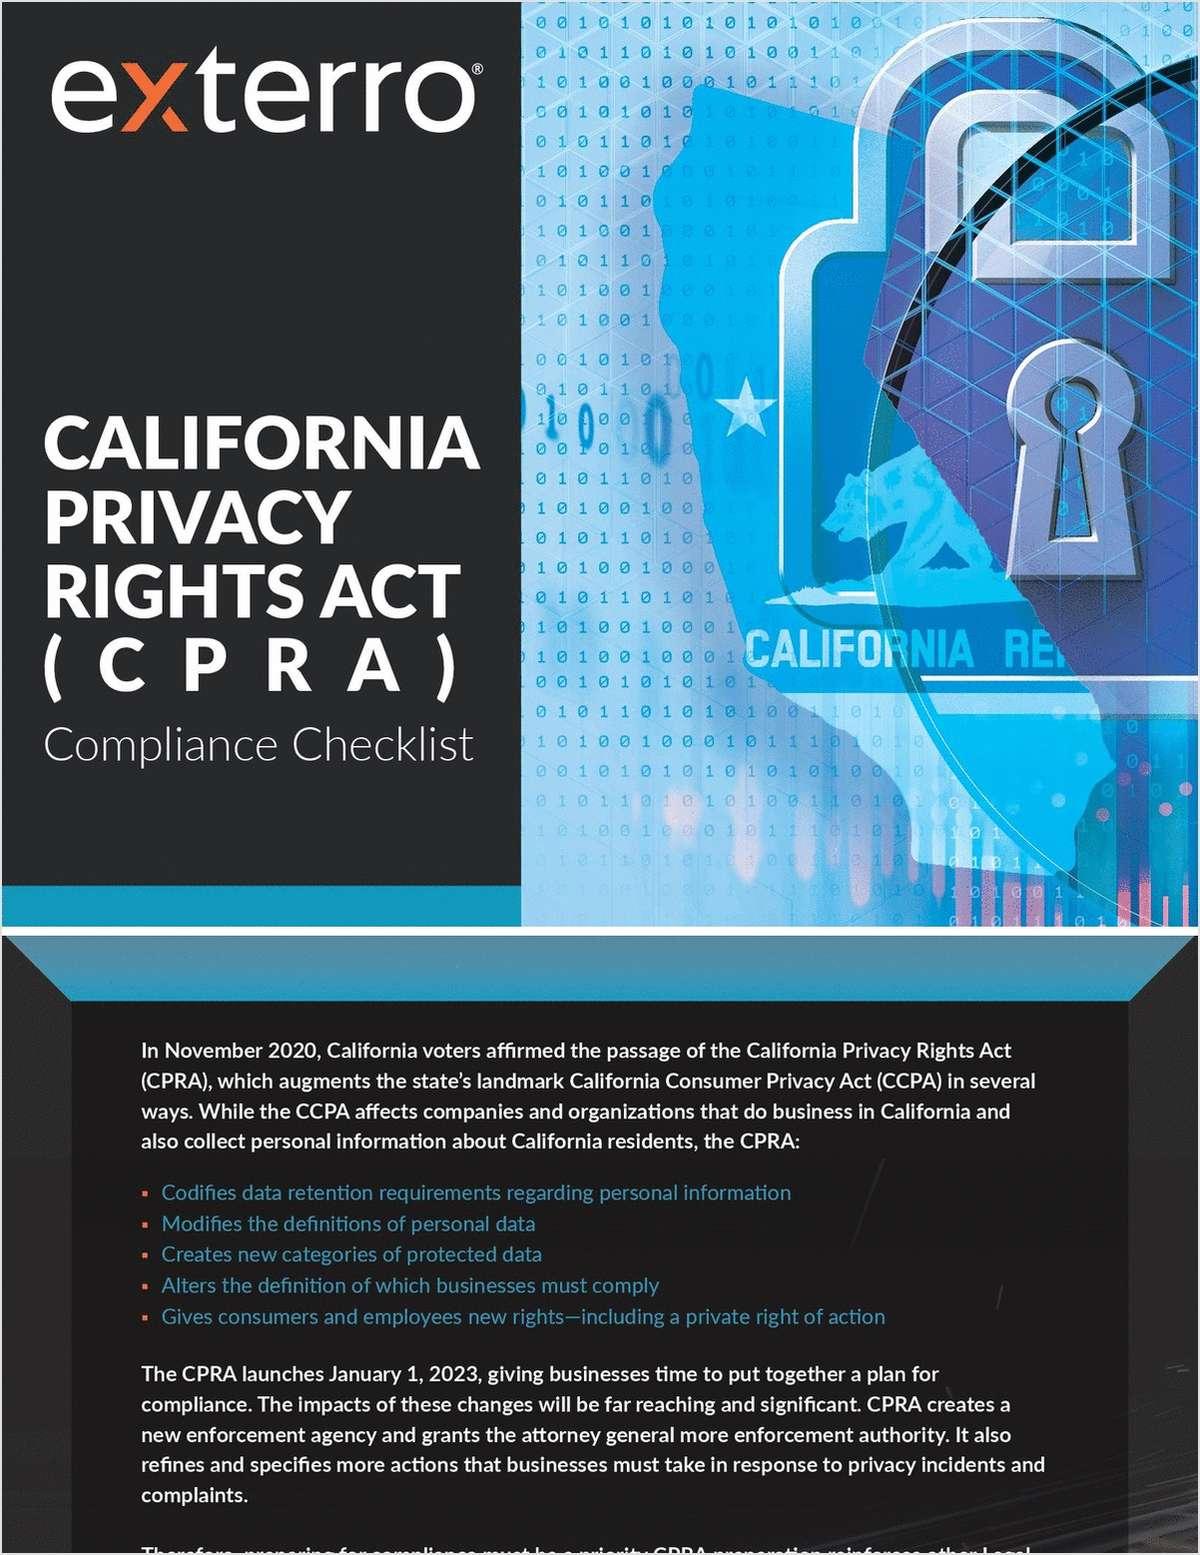 California Privacy Rights Act (CPRA): Compliance Checklist